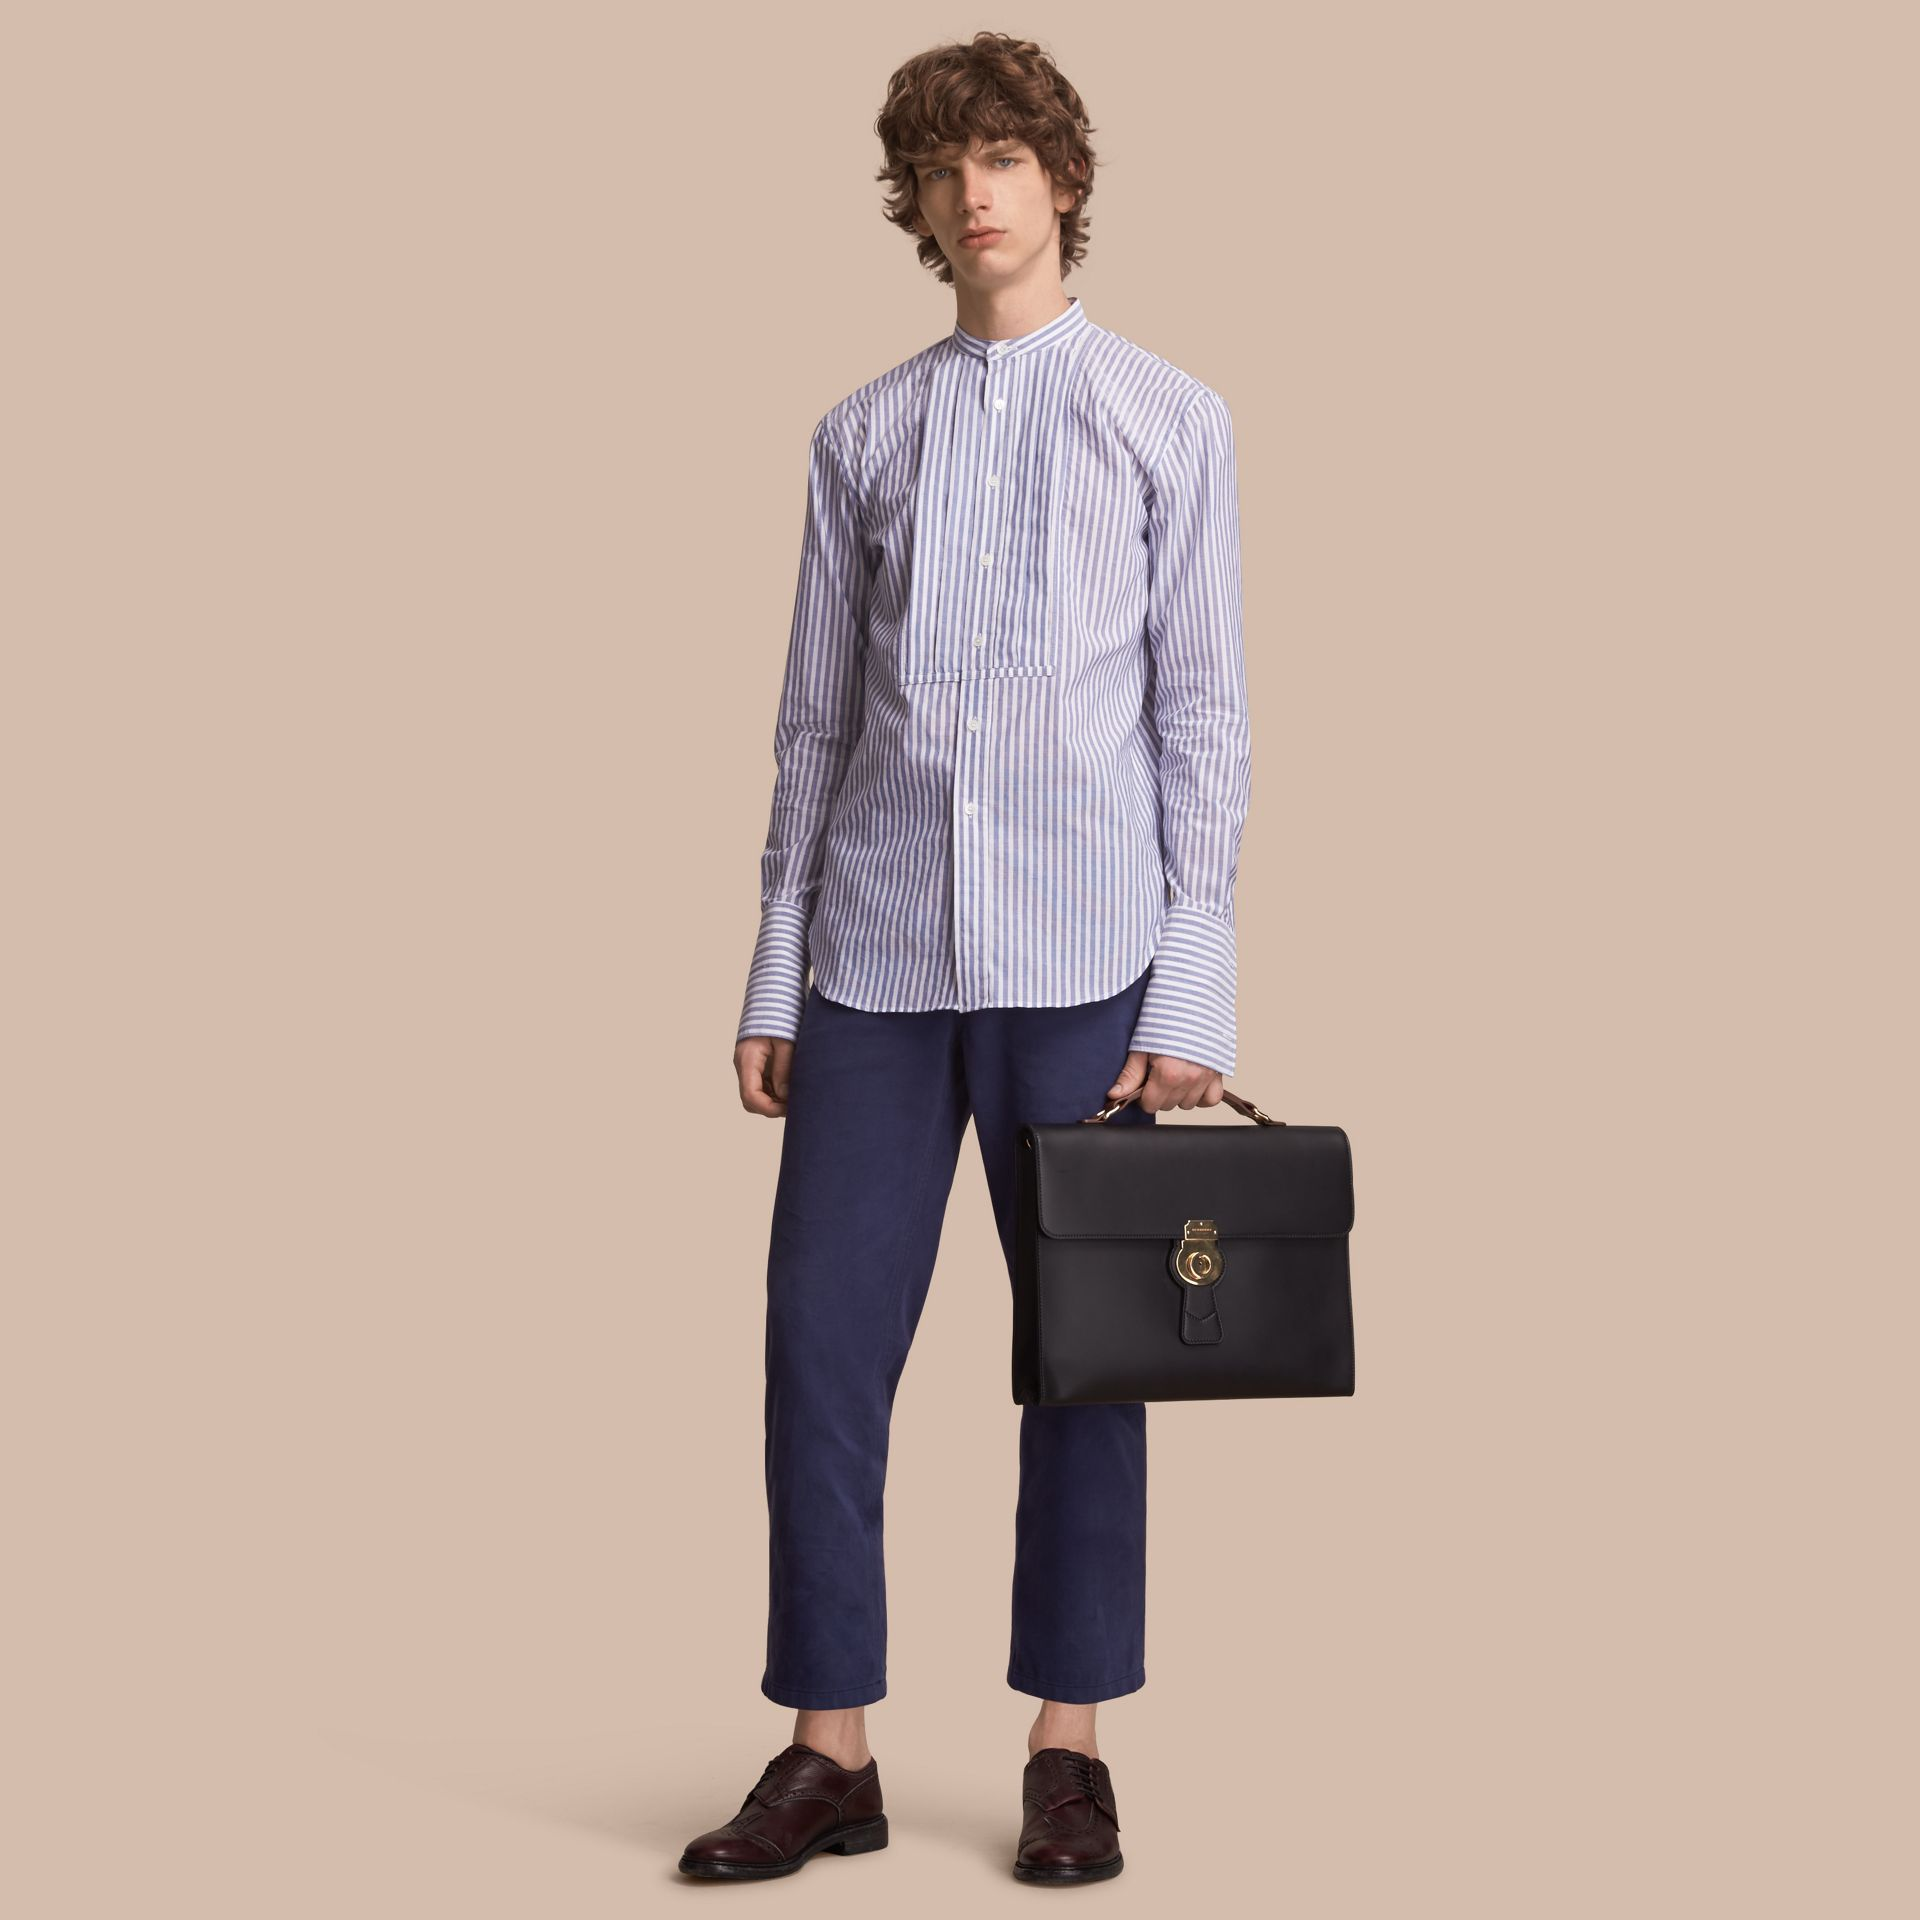 Unisex Pleated Bib Striped Cotton Shirt - gallery image 1